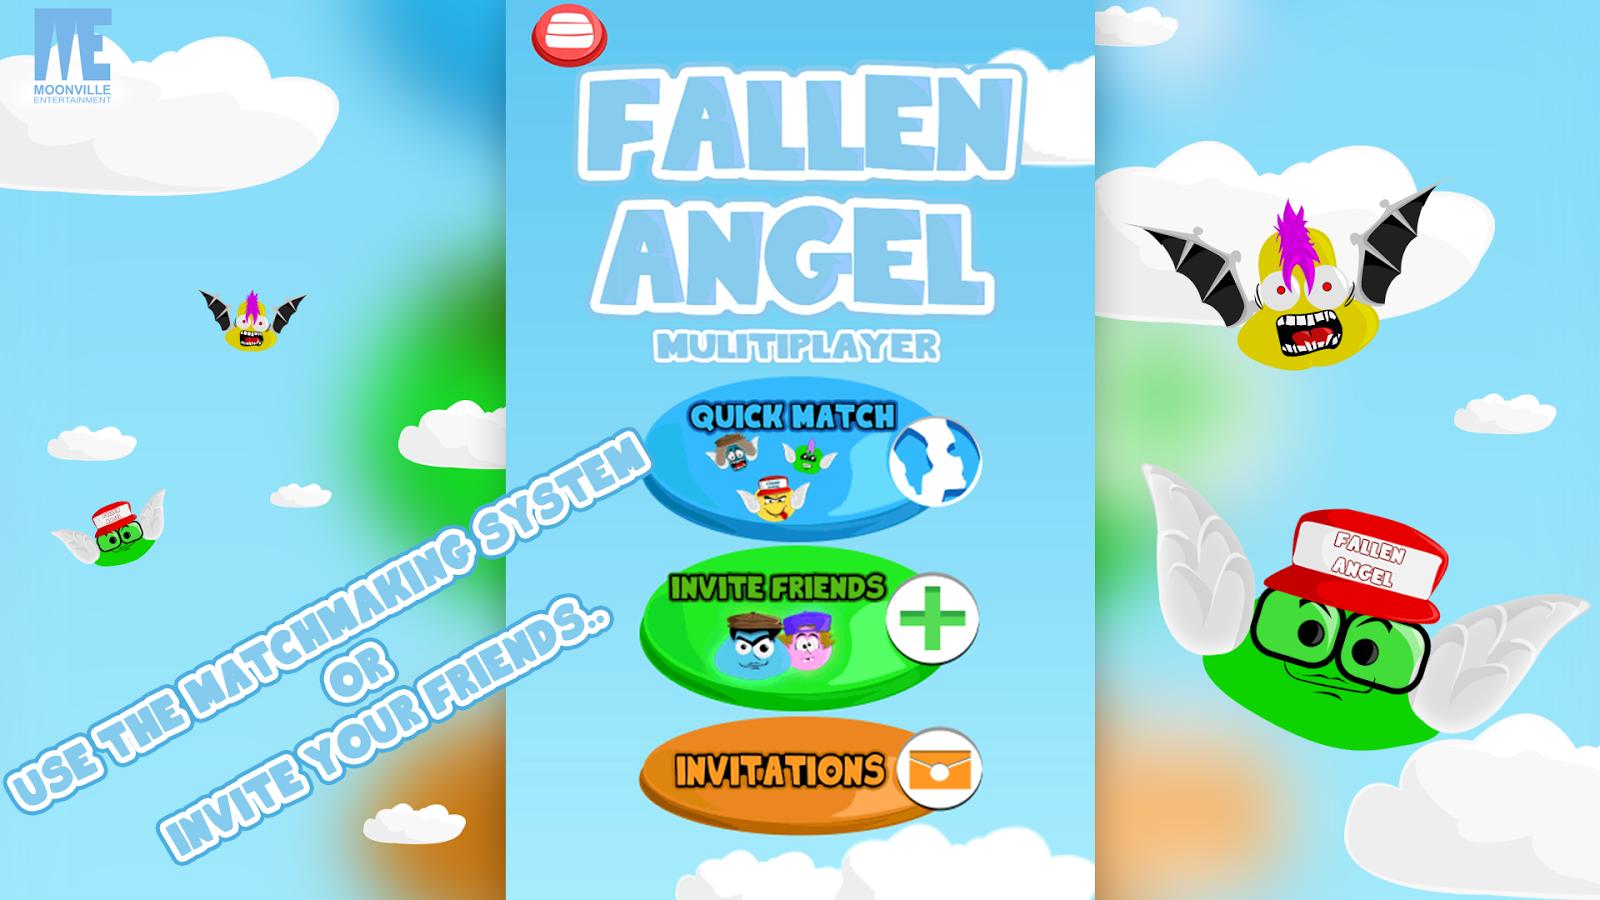 Fallen Angel clipart falen Angel: Fallen Angel: Google Play